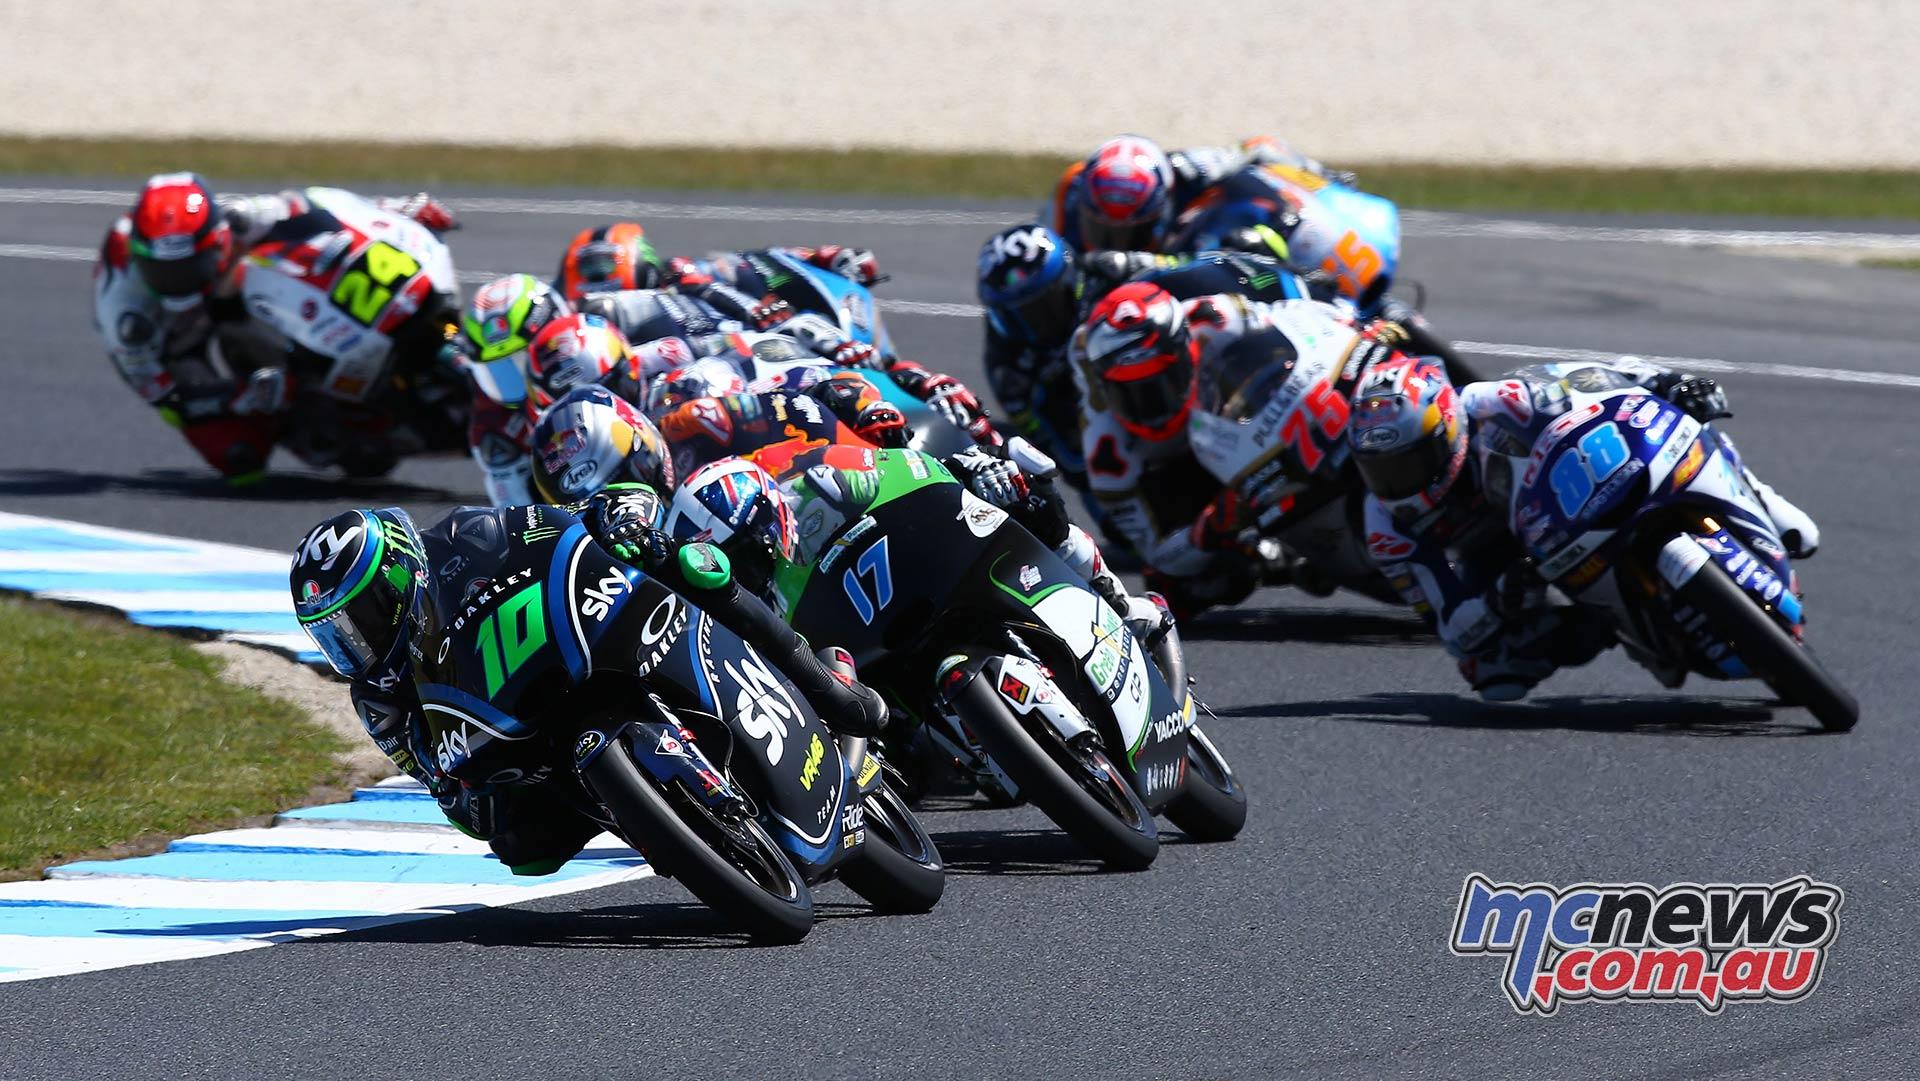 MotoGP Phillip Island Moto Foggia GP AN